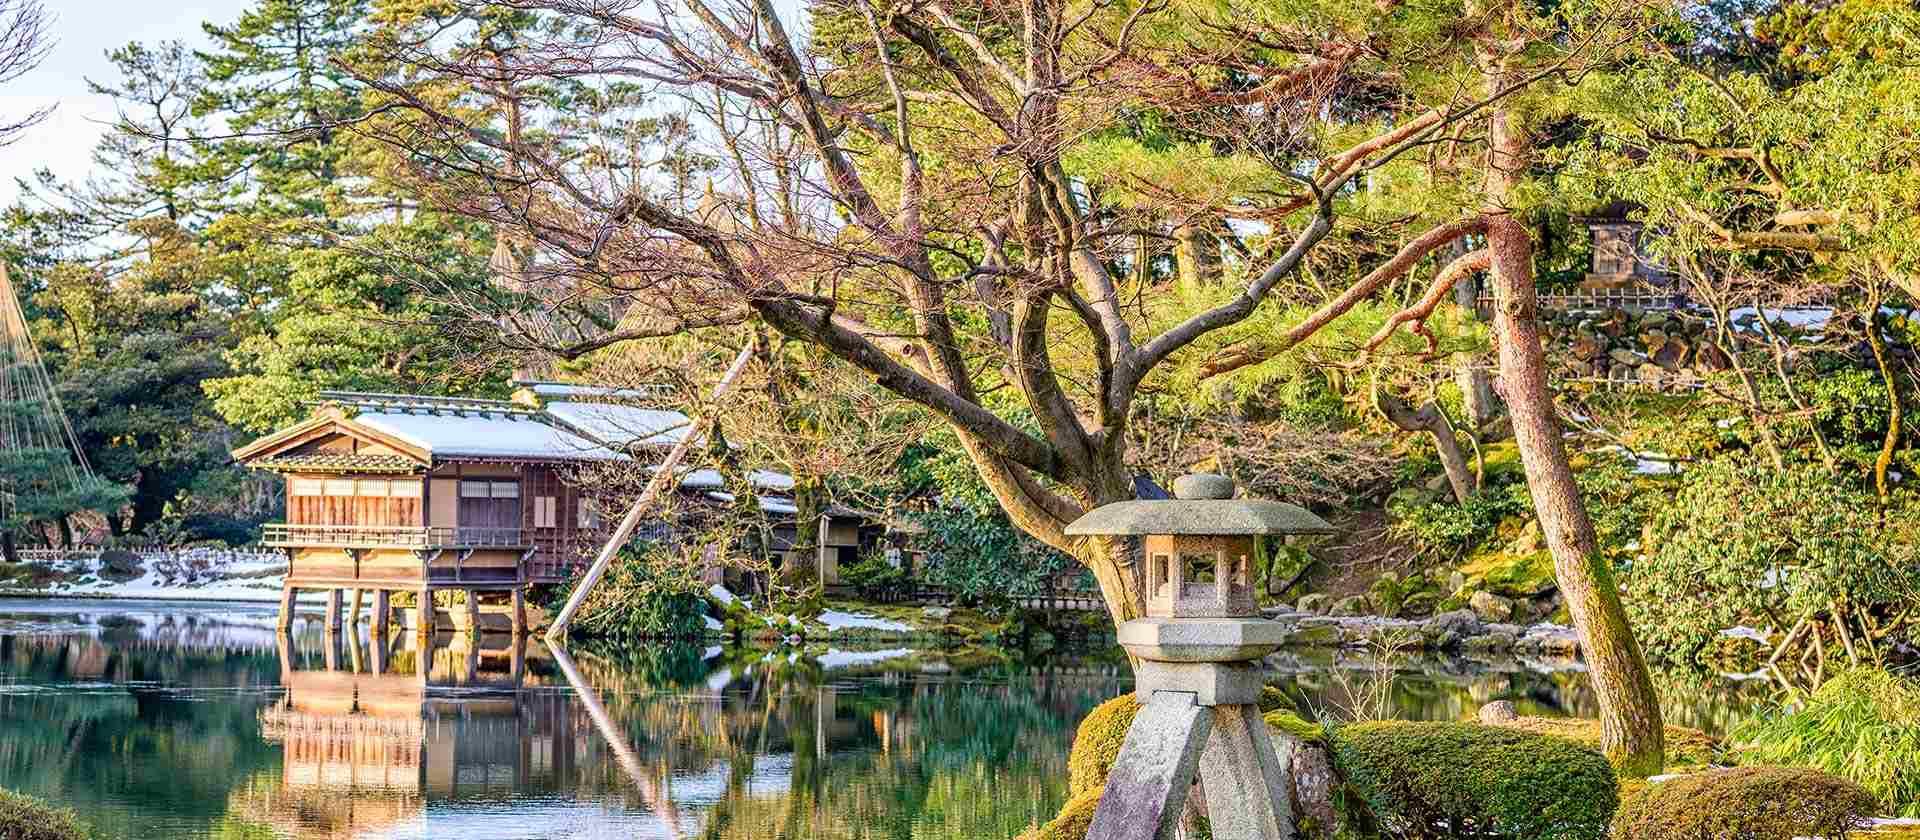 19th ISOLS Conference – Kanazawa 2017